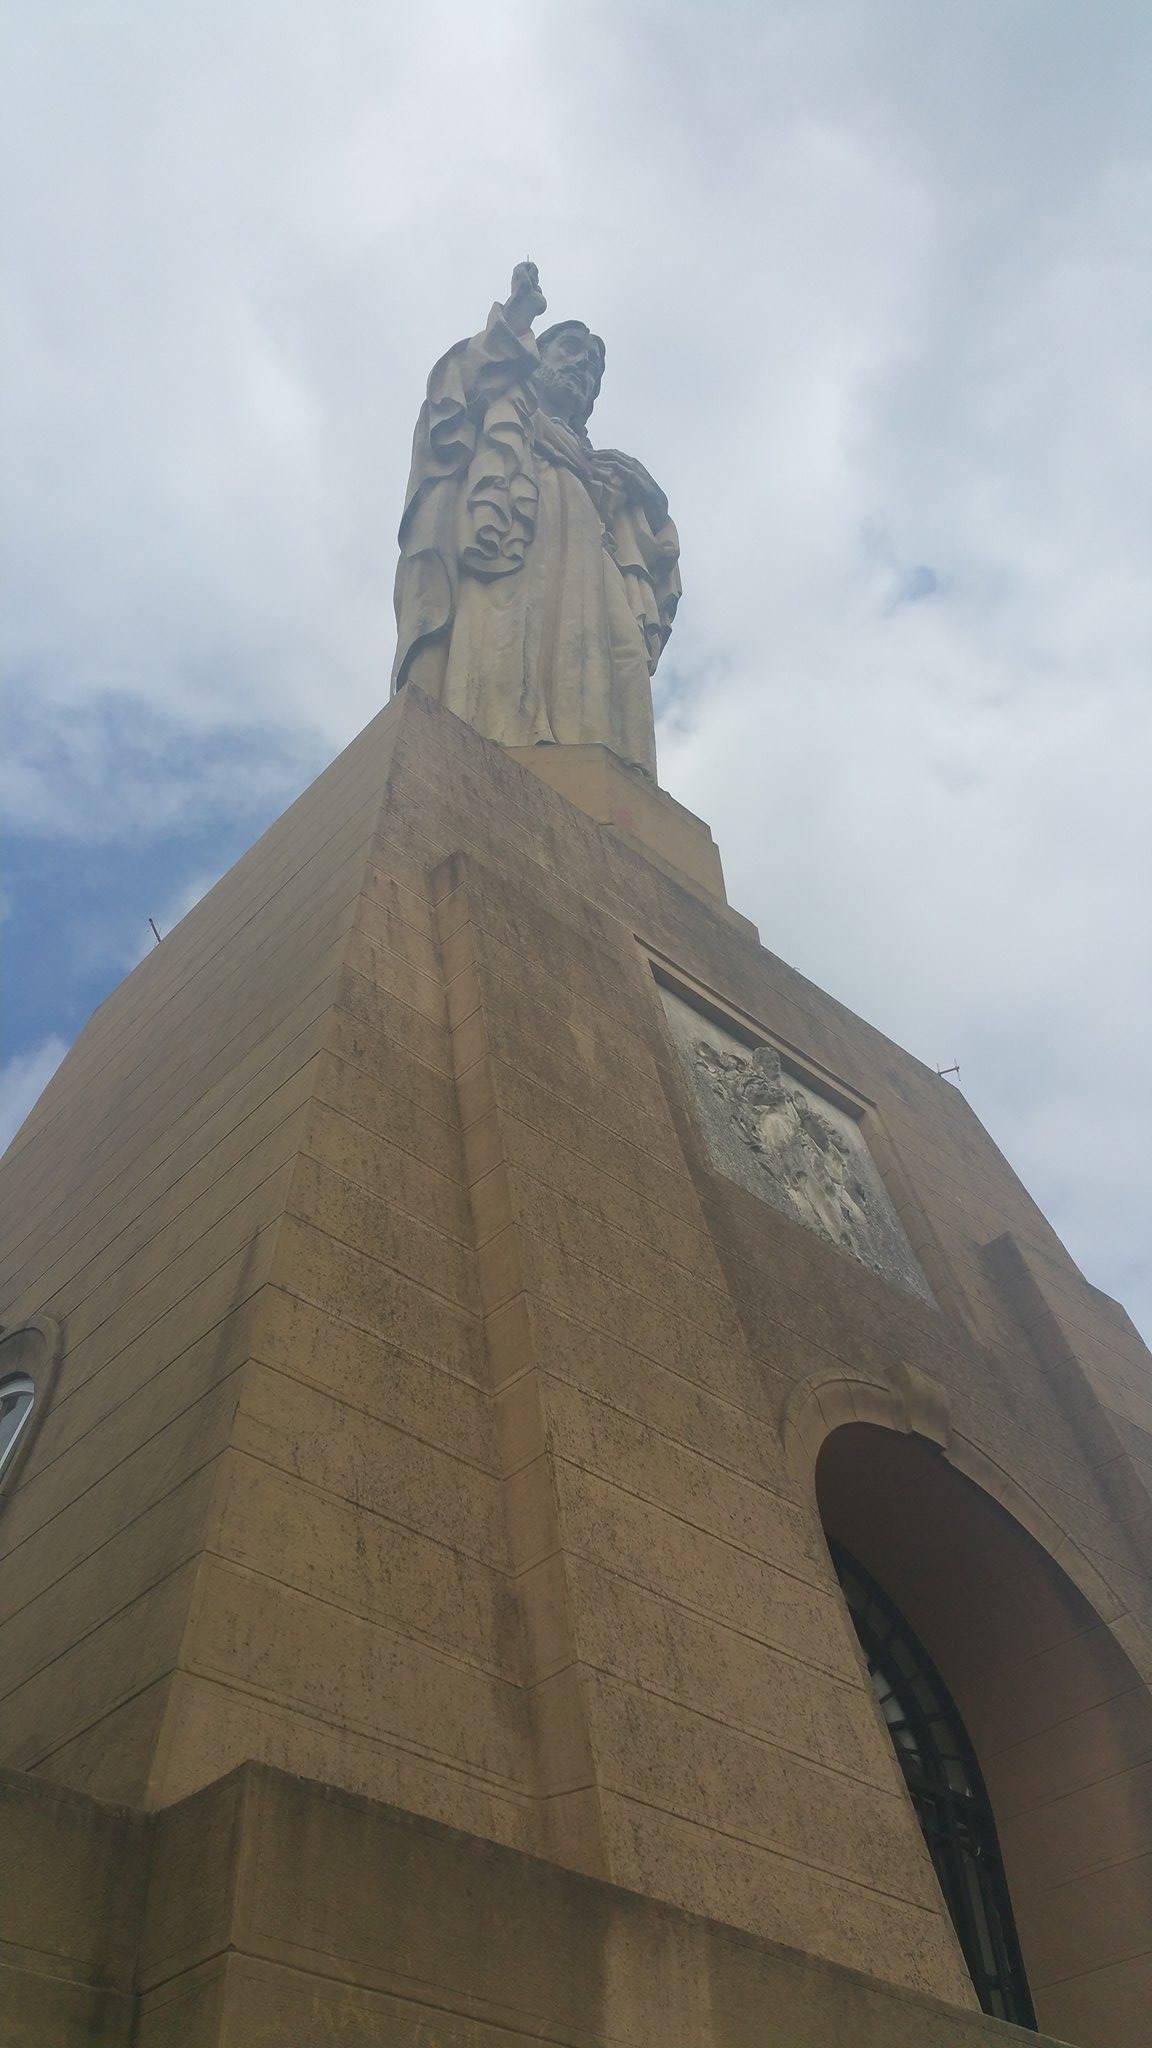 monte urgull jesus statue